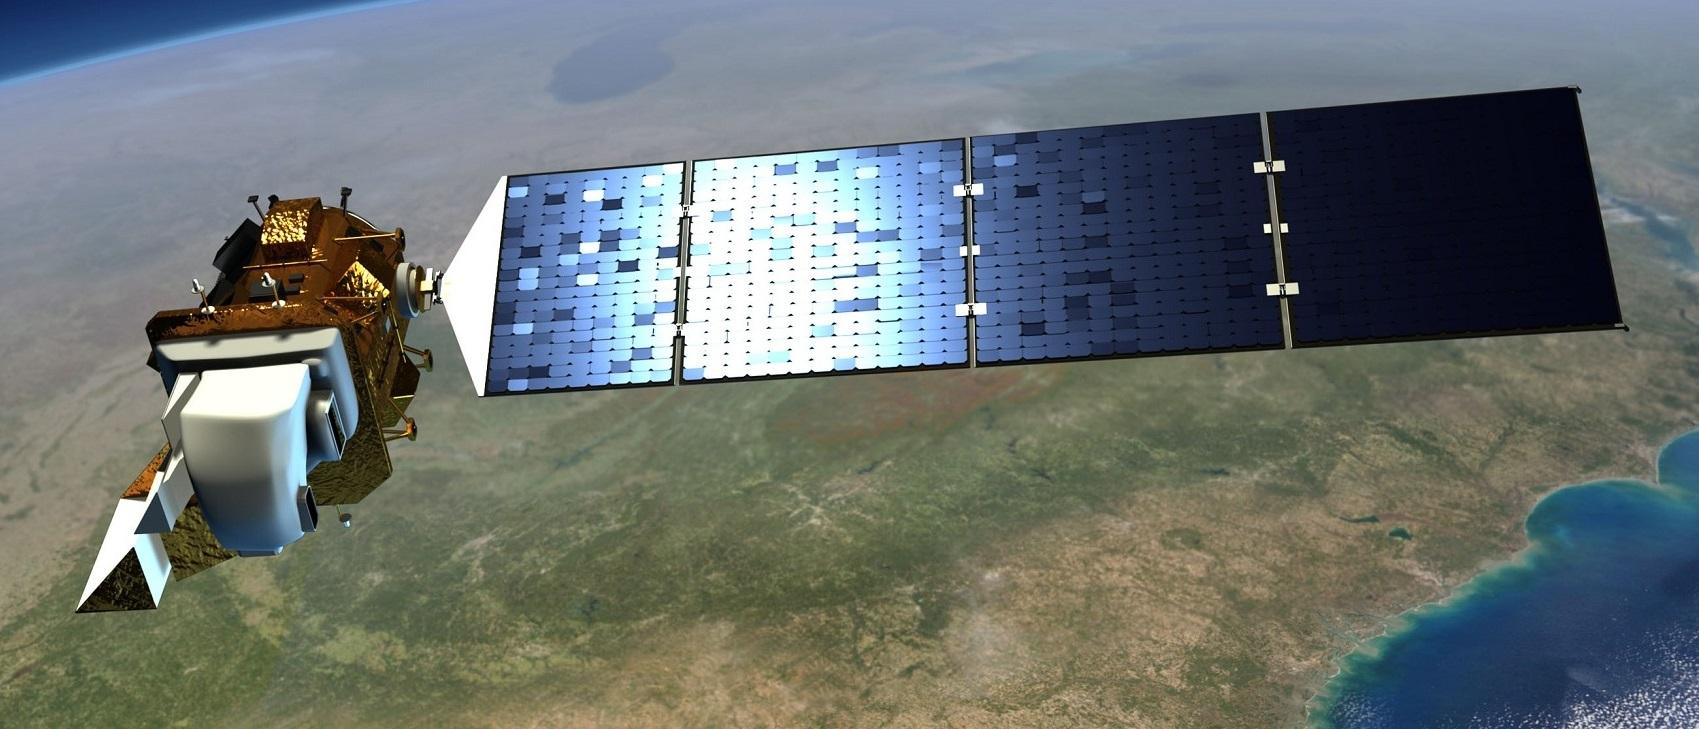 Artist's concept of Landsat 9, an upgraded rebuild of the Landsat 8 satellite launched in February 2013. Credit: NASA